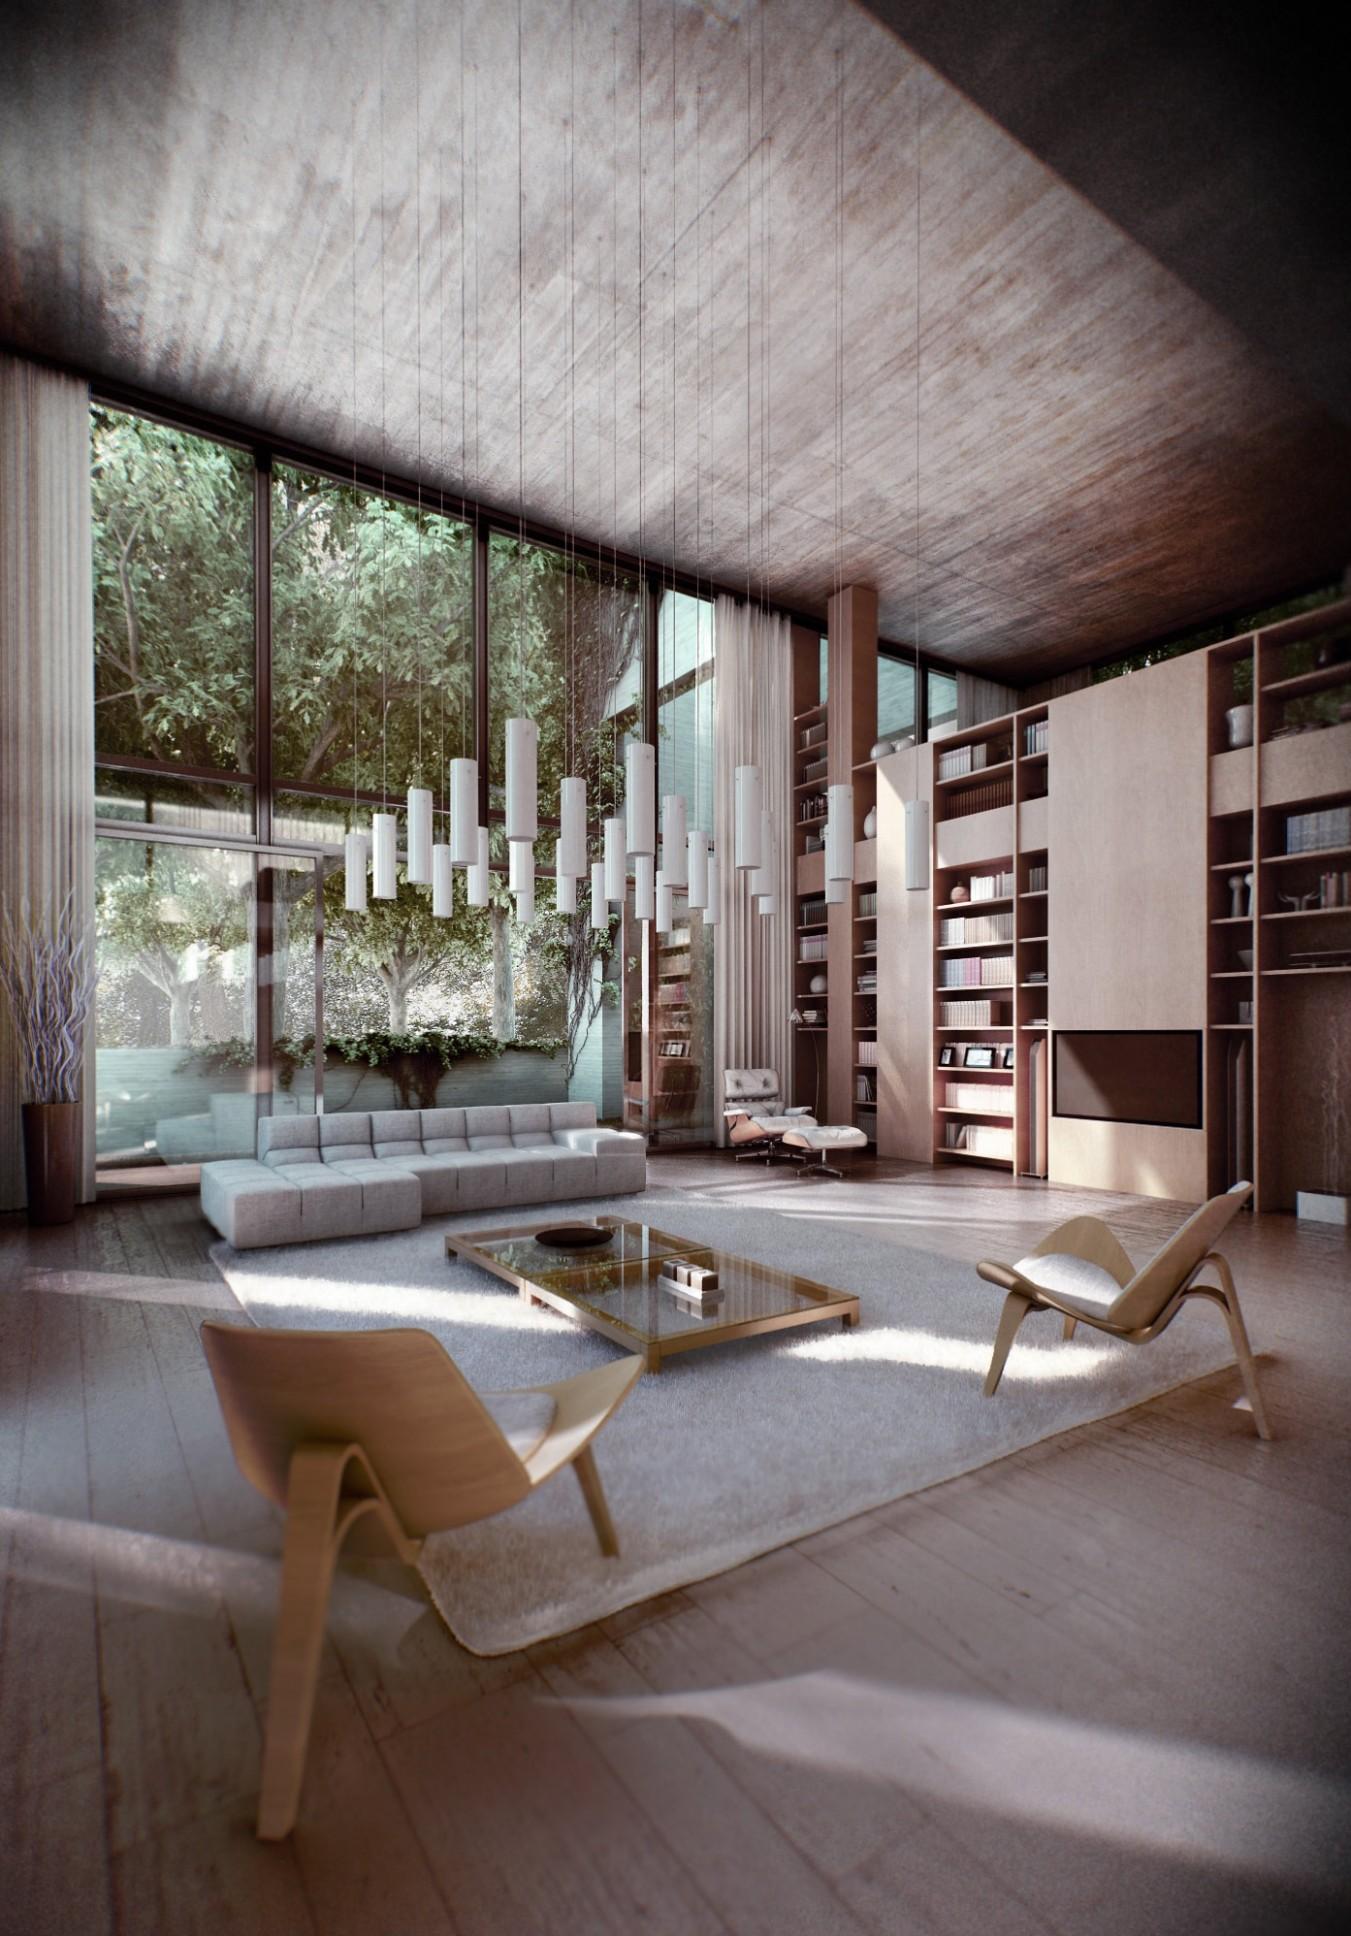 Zen Inspired Interior Design - Japanese Home Office Ideas